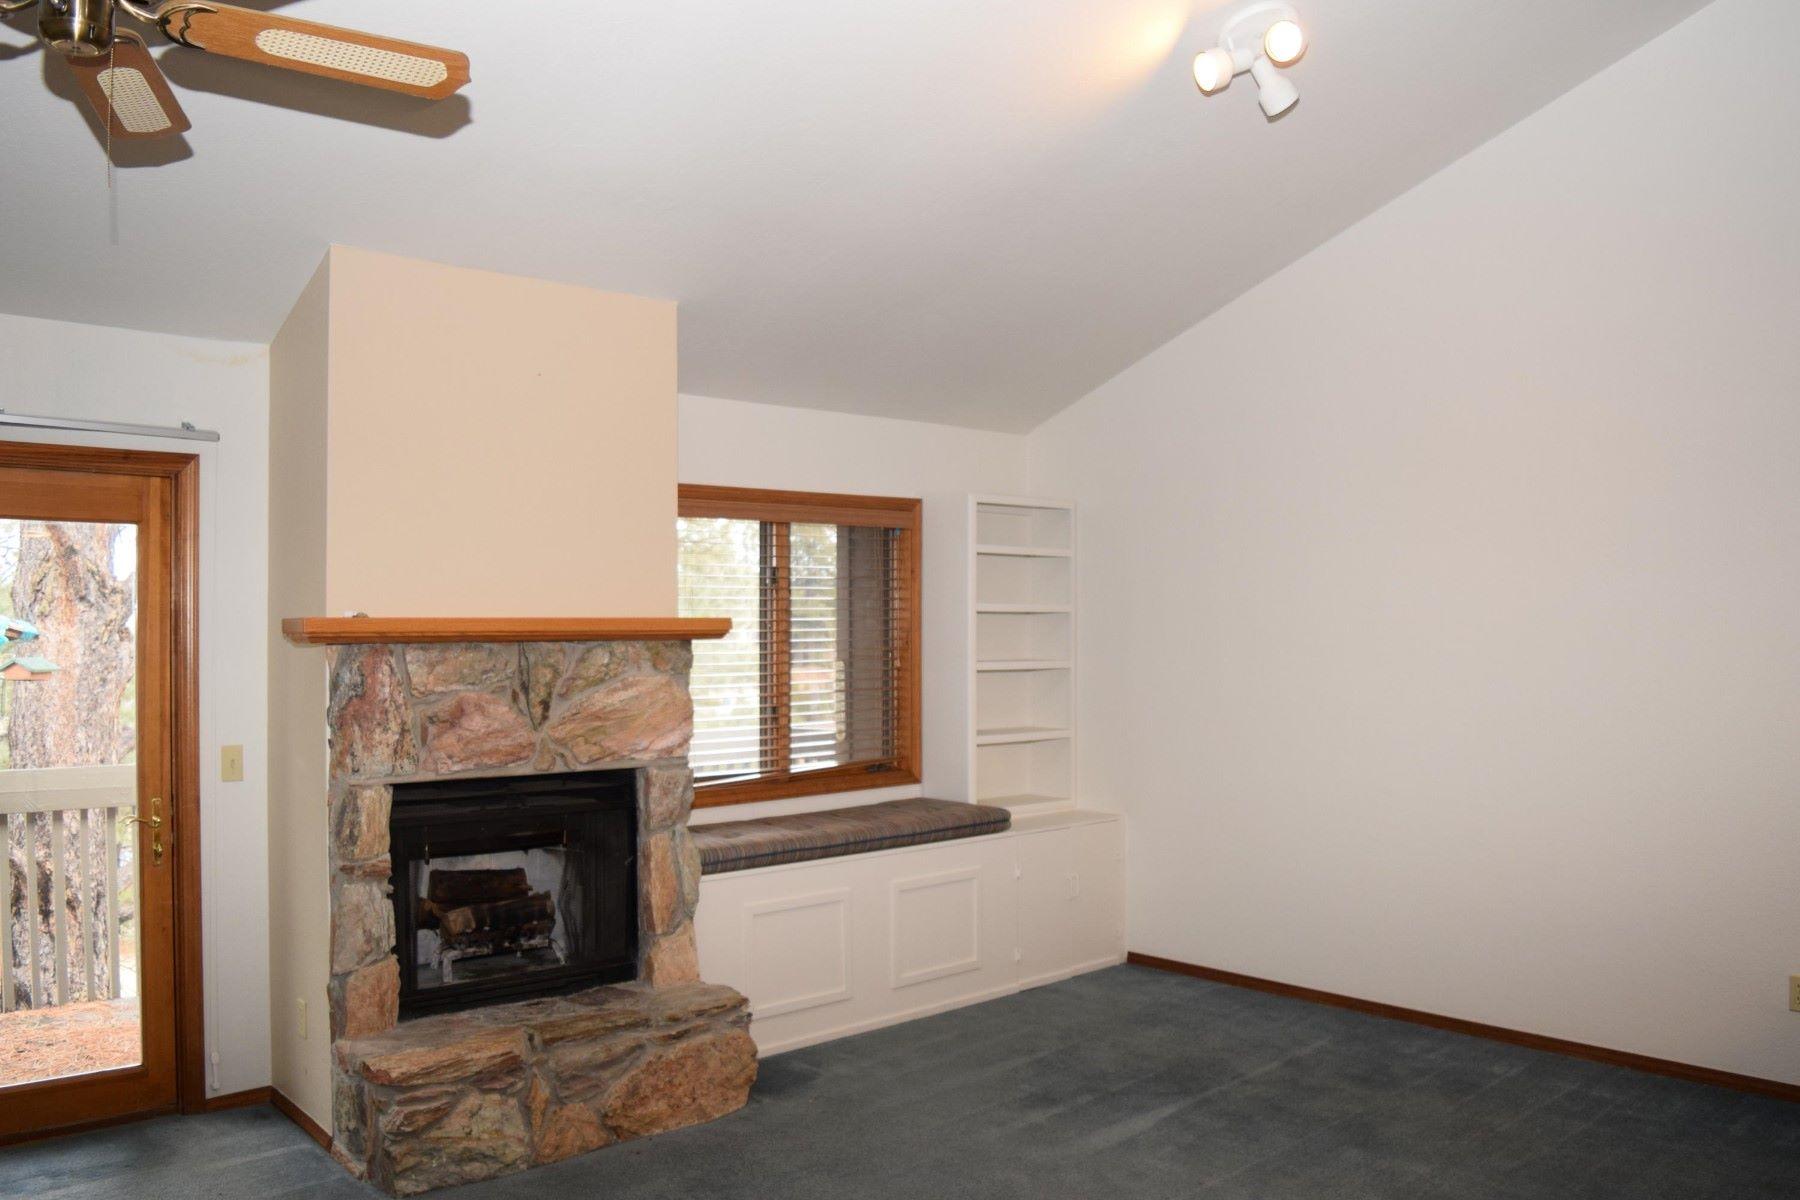 شقة بعمارة للـ Sale في Well Cared for Clean Condo 5701 N Villa Circle, Flagstaff, Arizona, 86004 United States